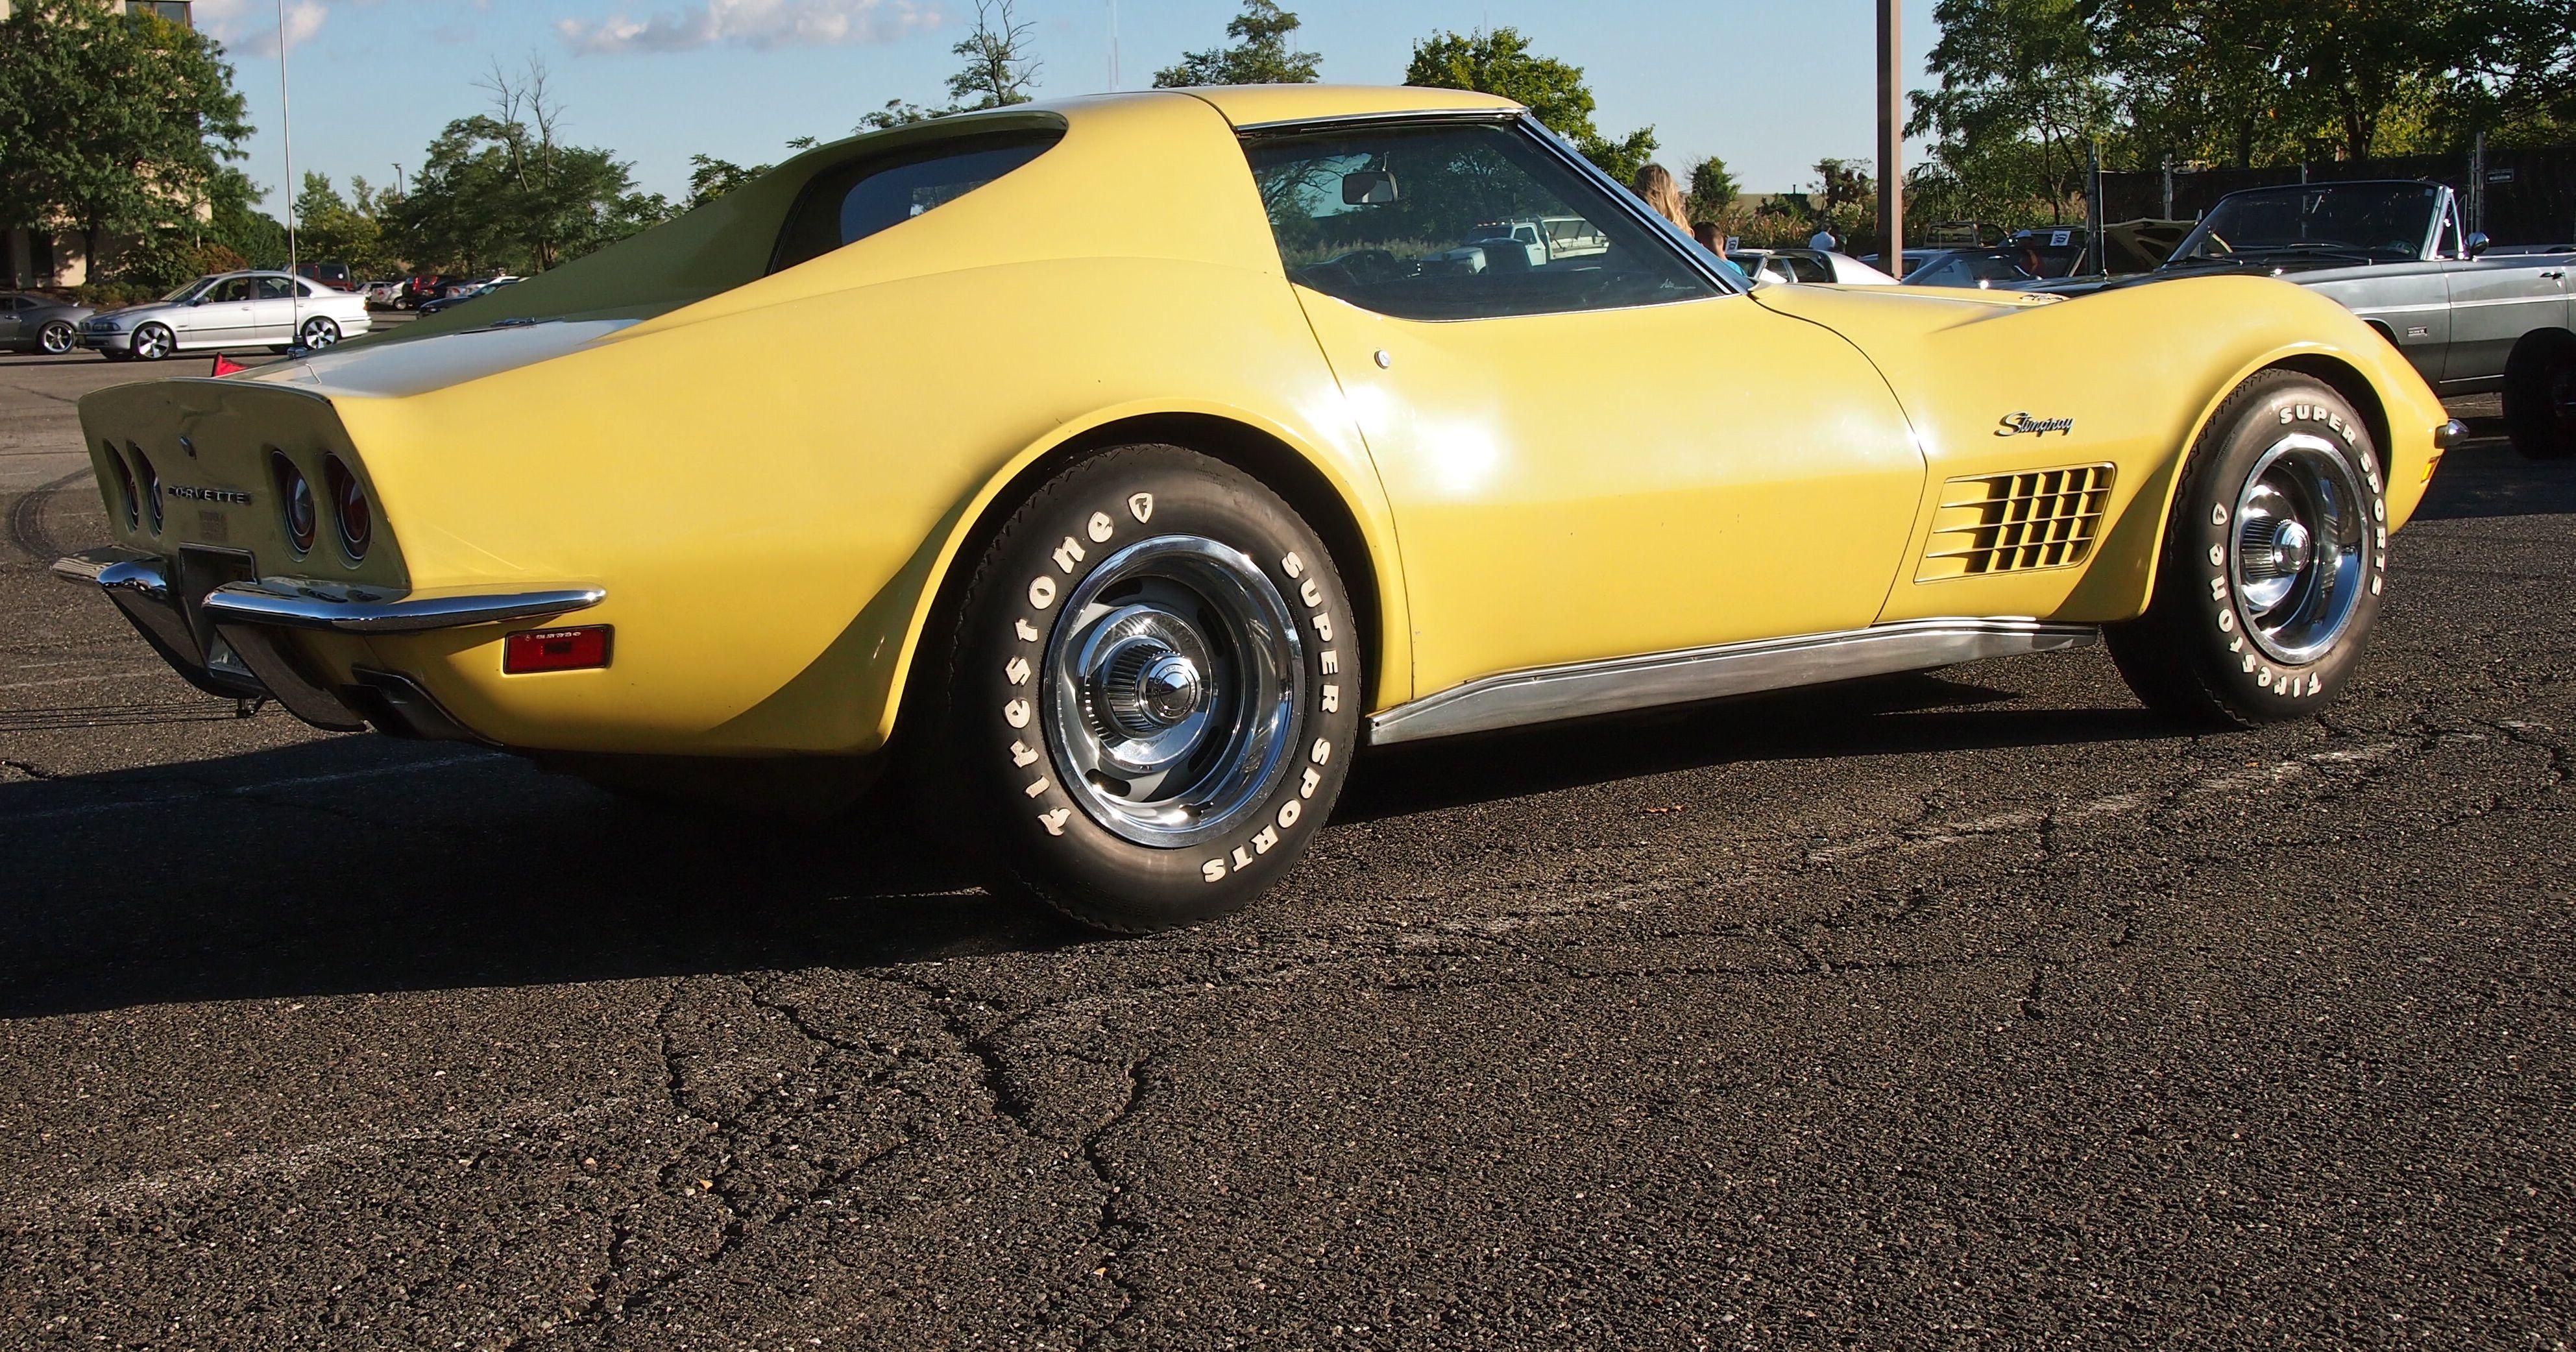 Yellow Vette. Pic by Joe Danon